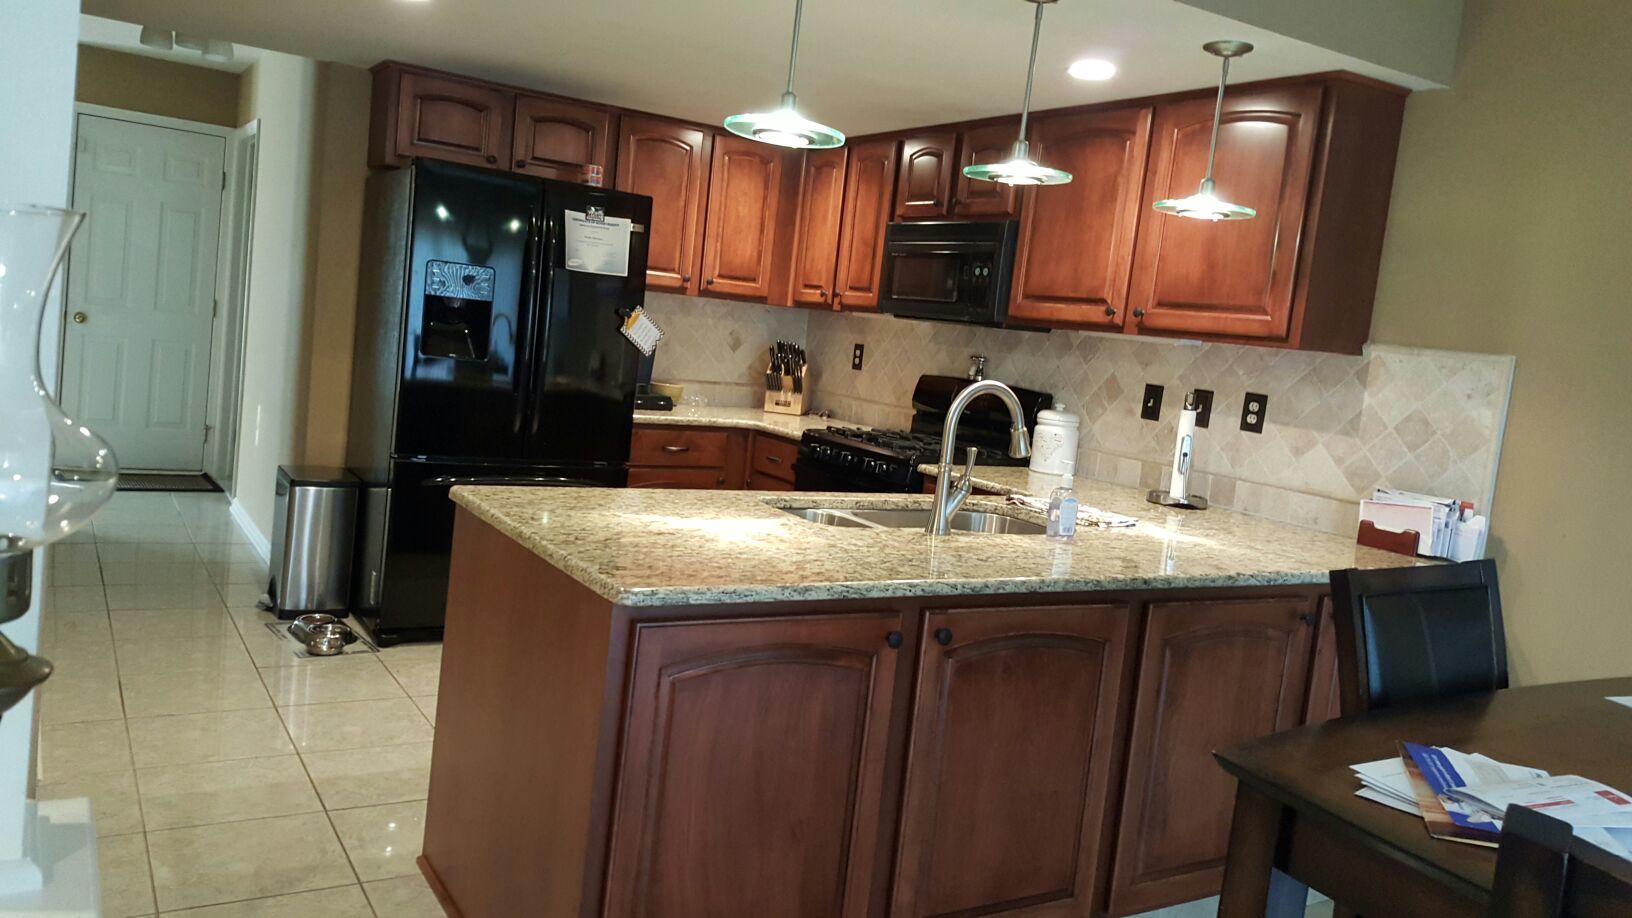 Doylestown Kitchen Cabinet Reface - After Photo